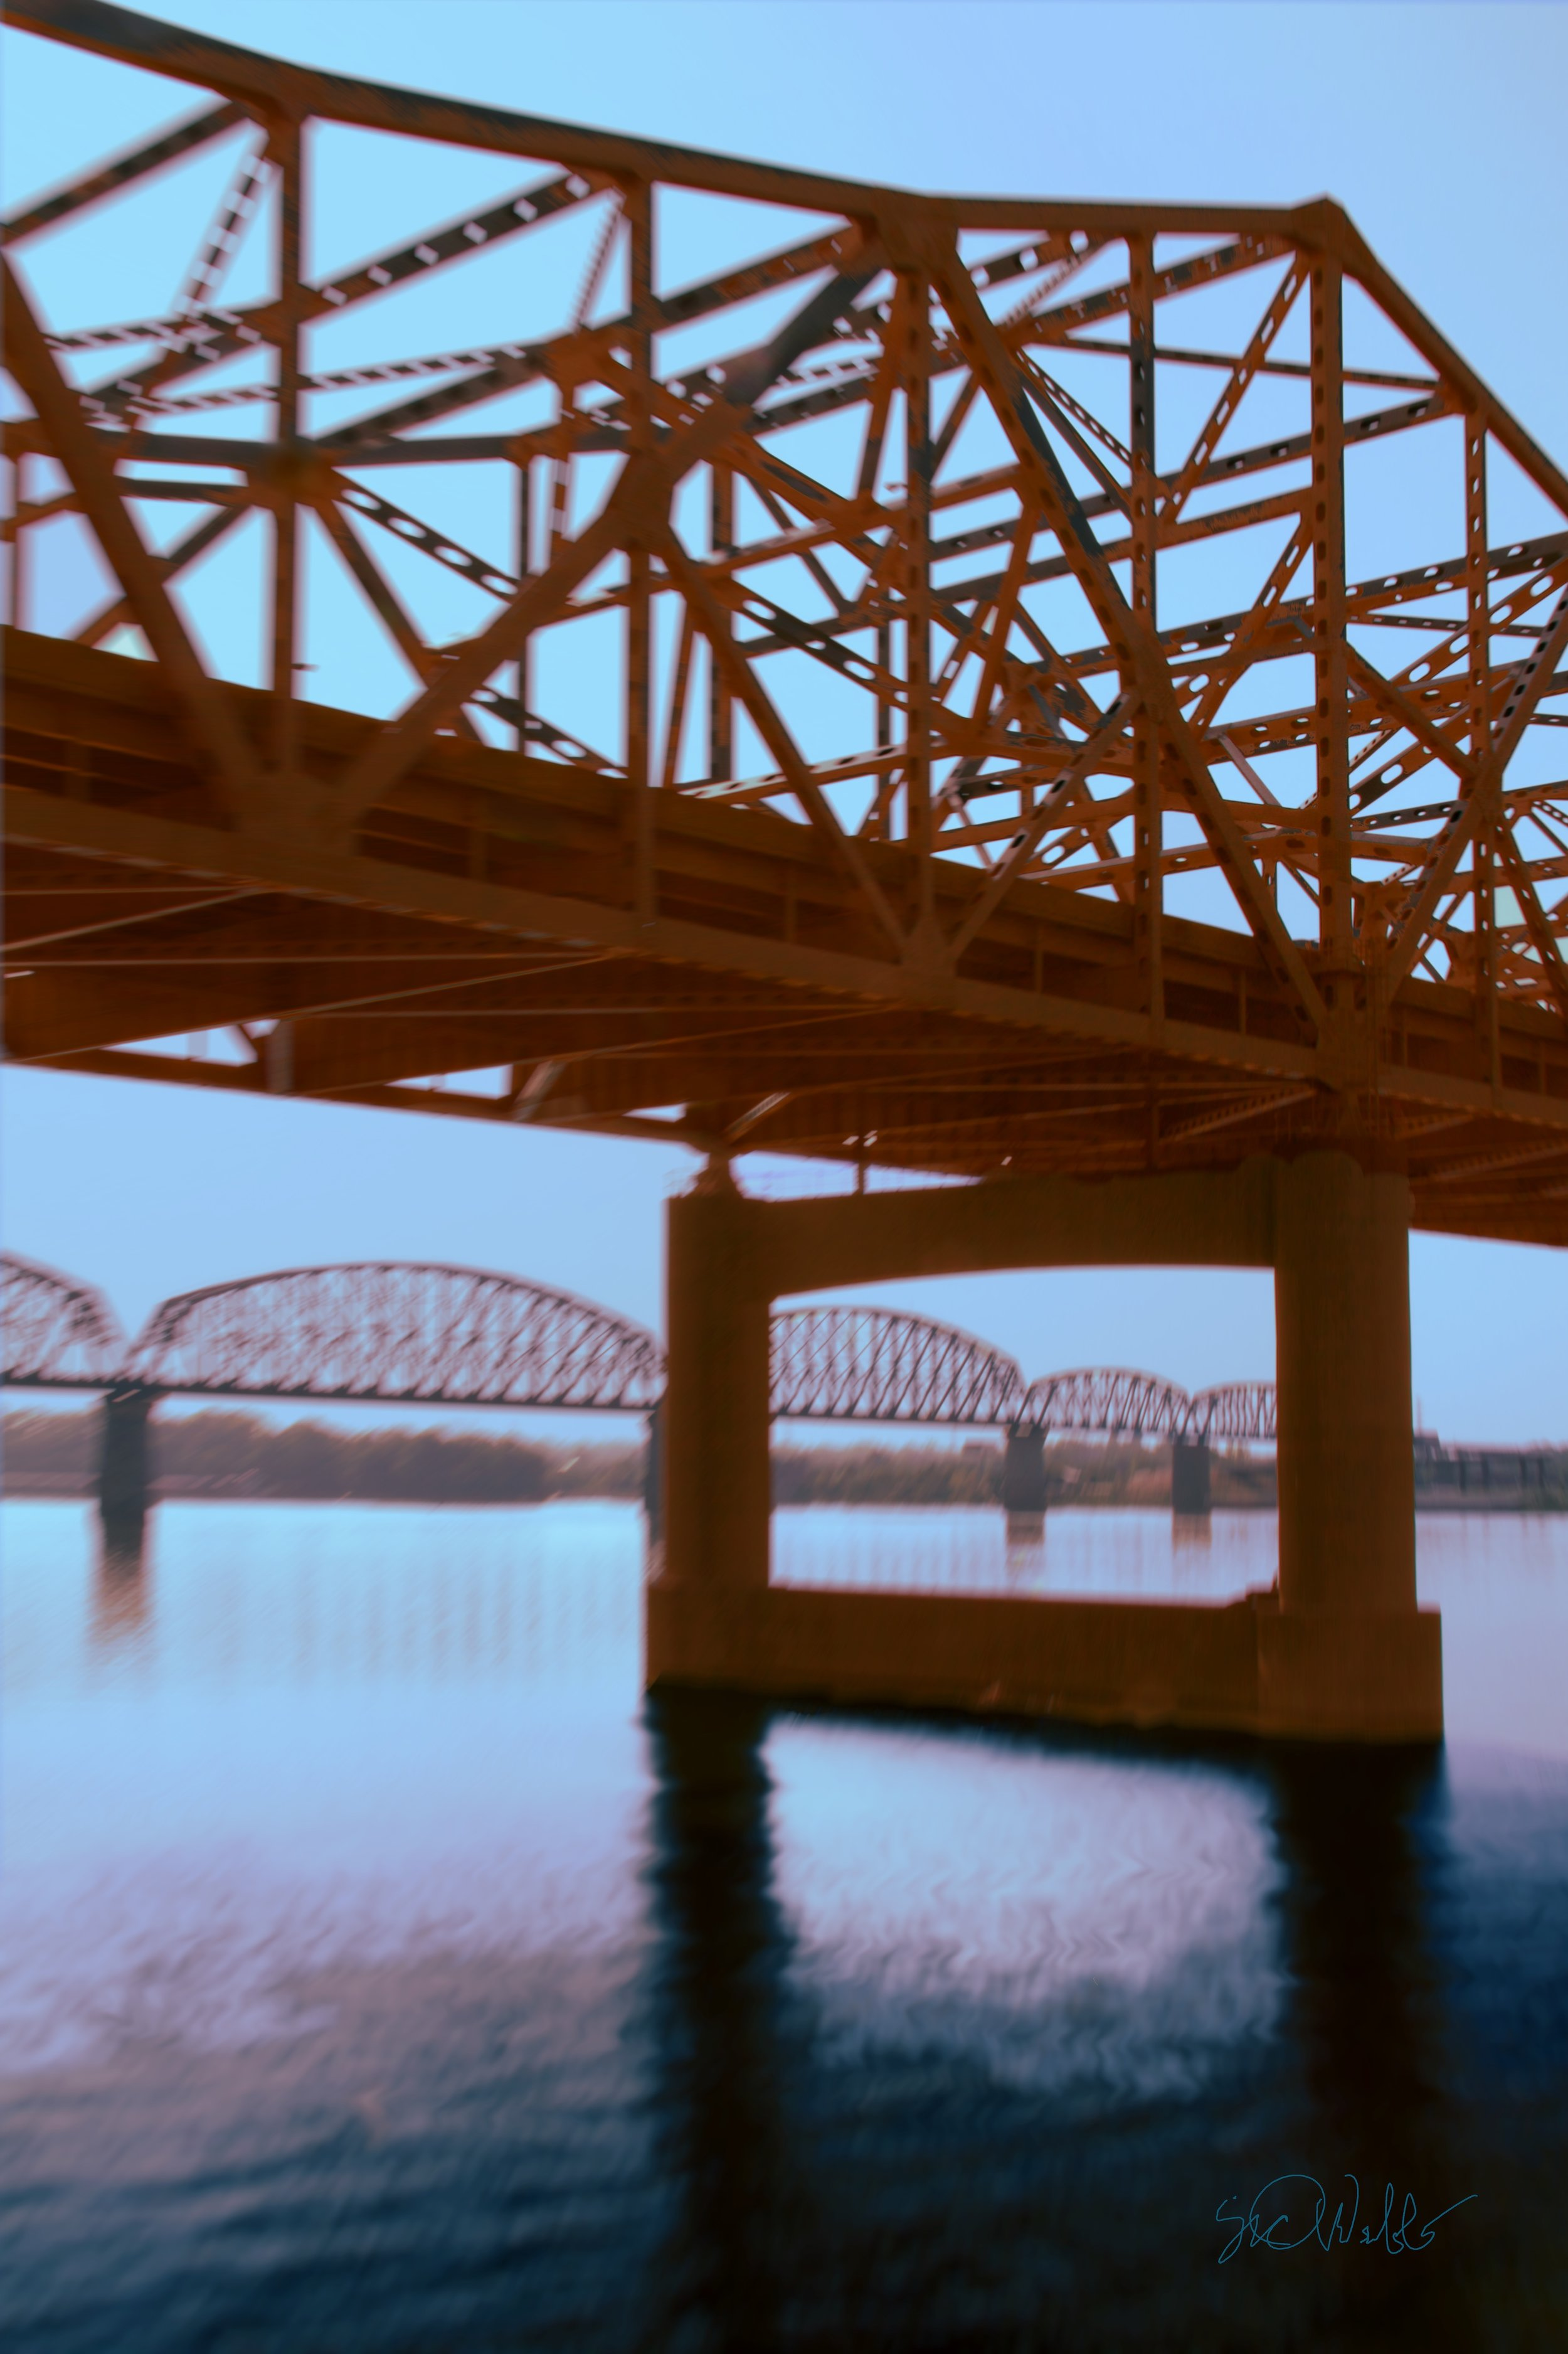 """Bridges"" by Sid Webb, Photograph, 12x18in, 2018, $125"